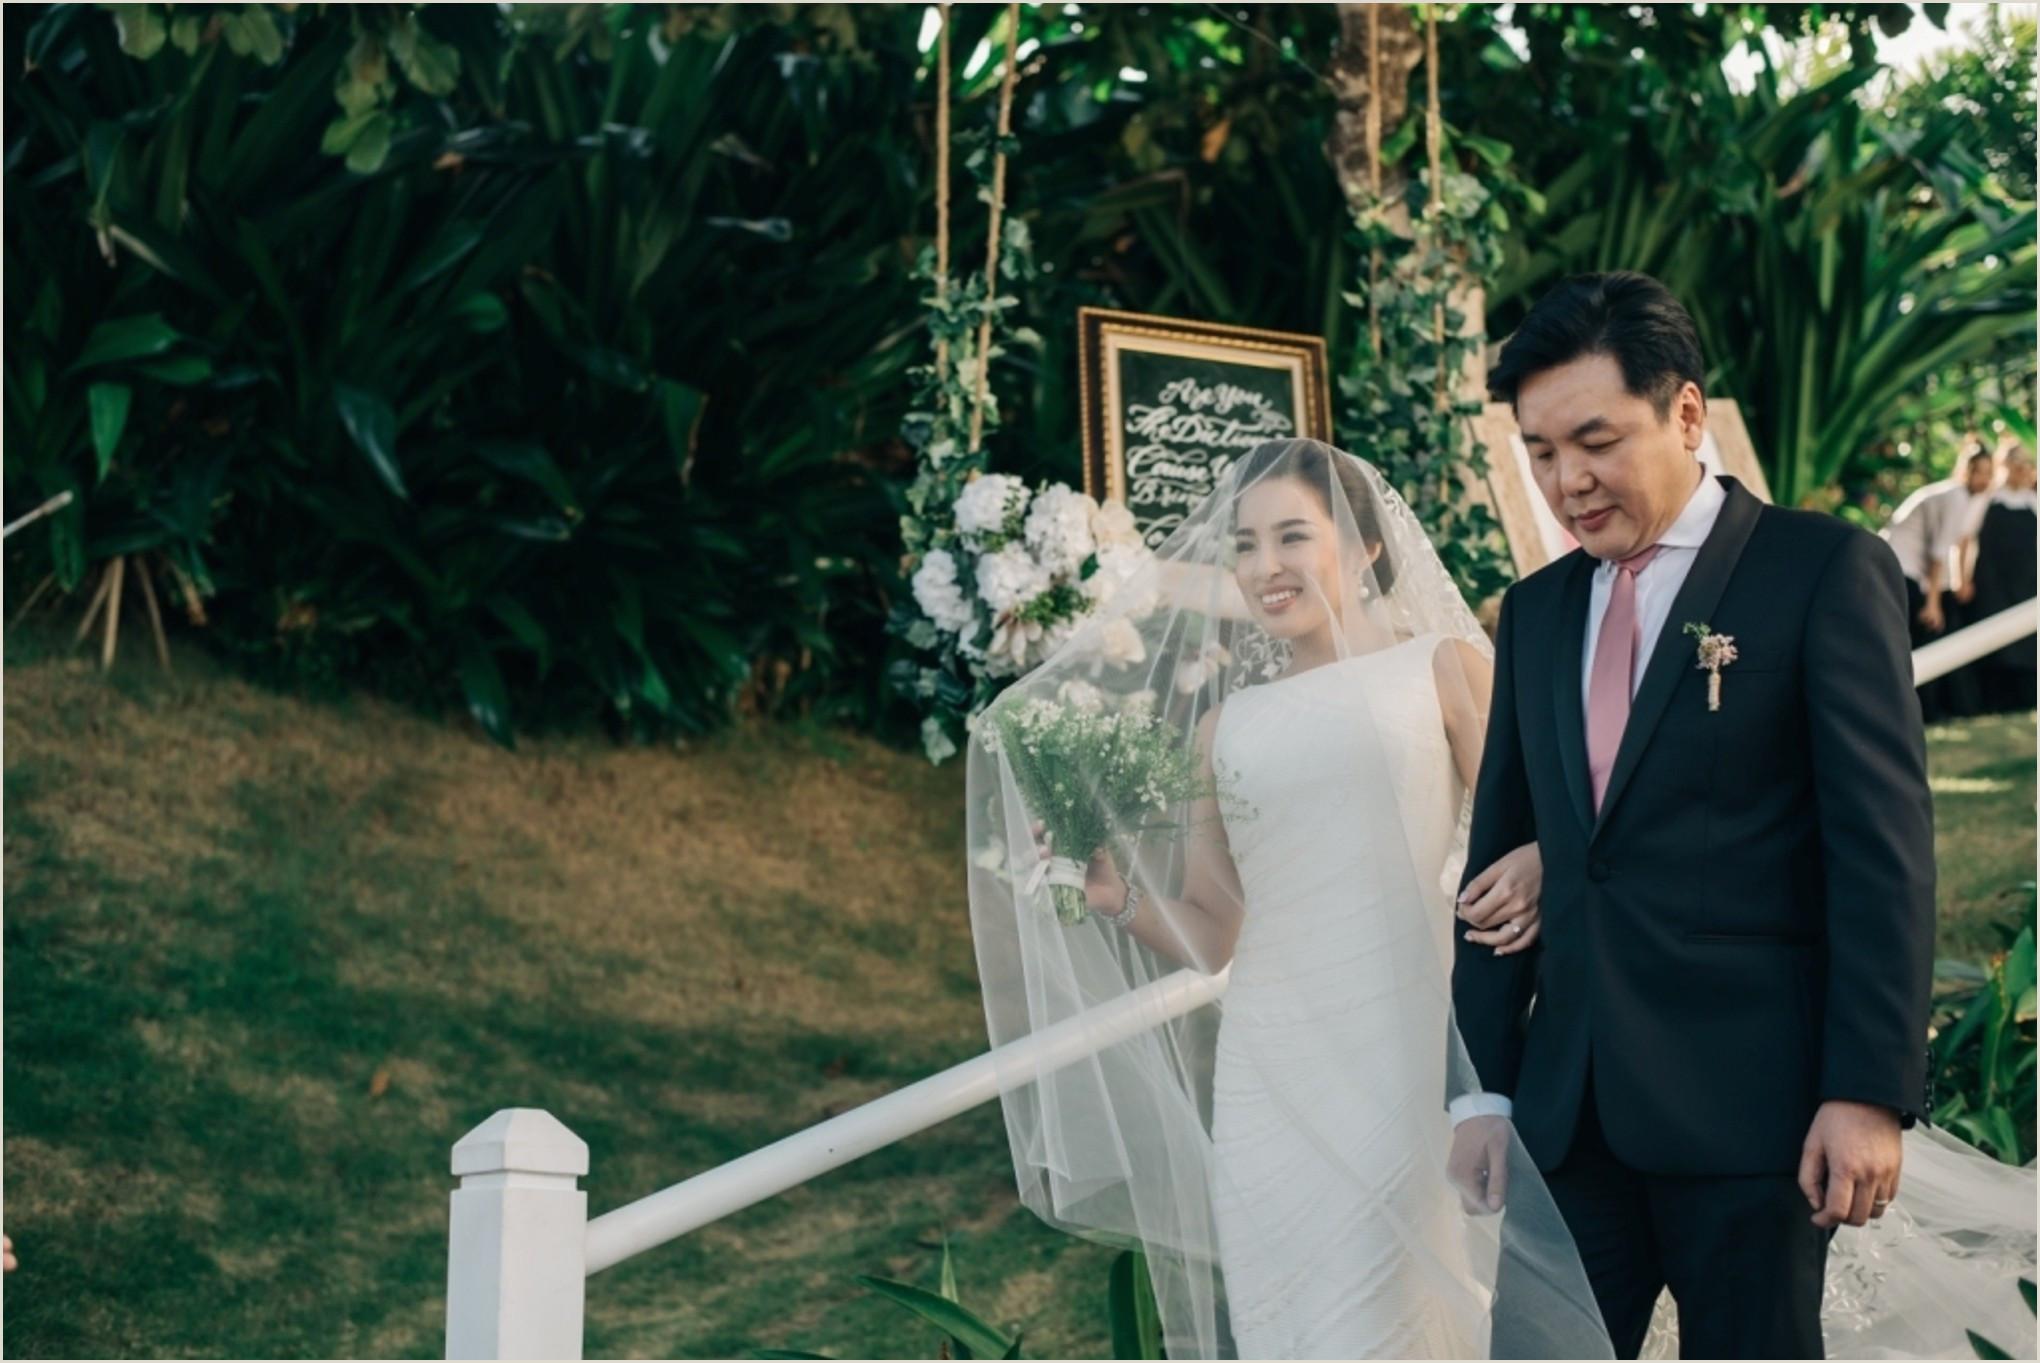 Wedding Dresses Joplin Mo Arnold Poernomo and Tiffany soetanto S Wedding In Bali